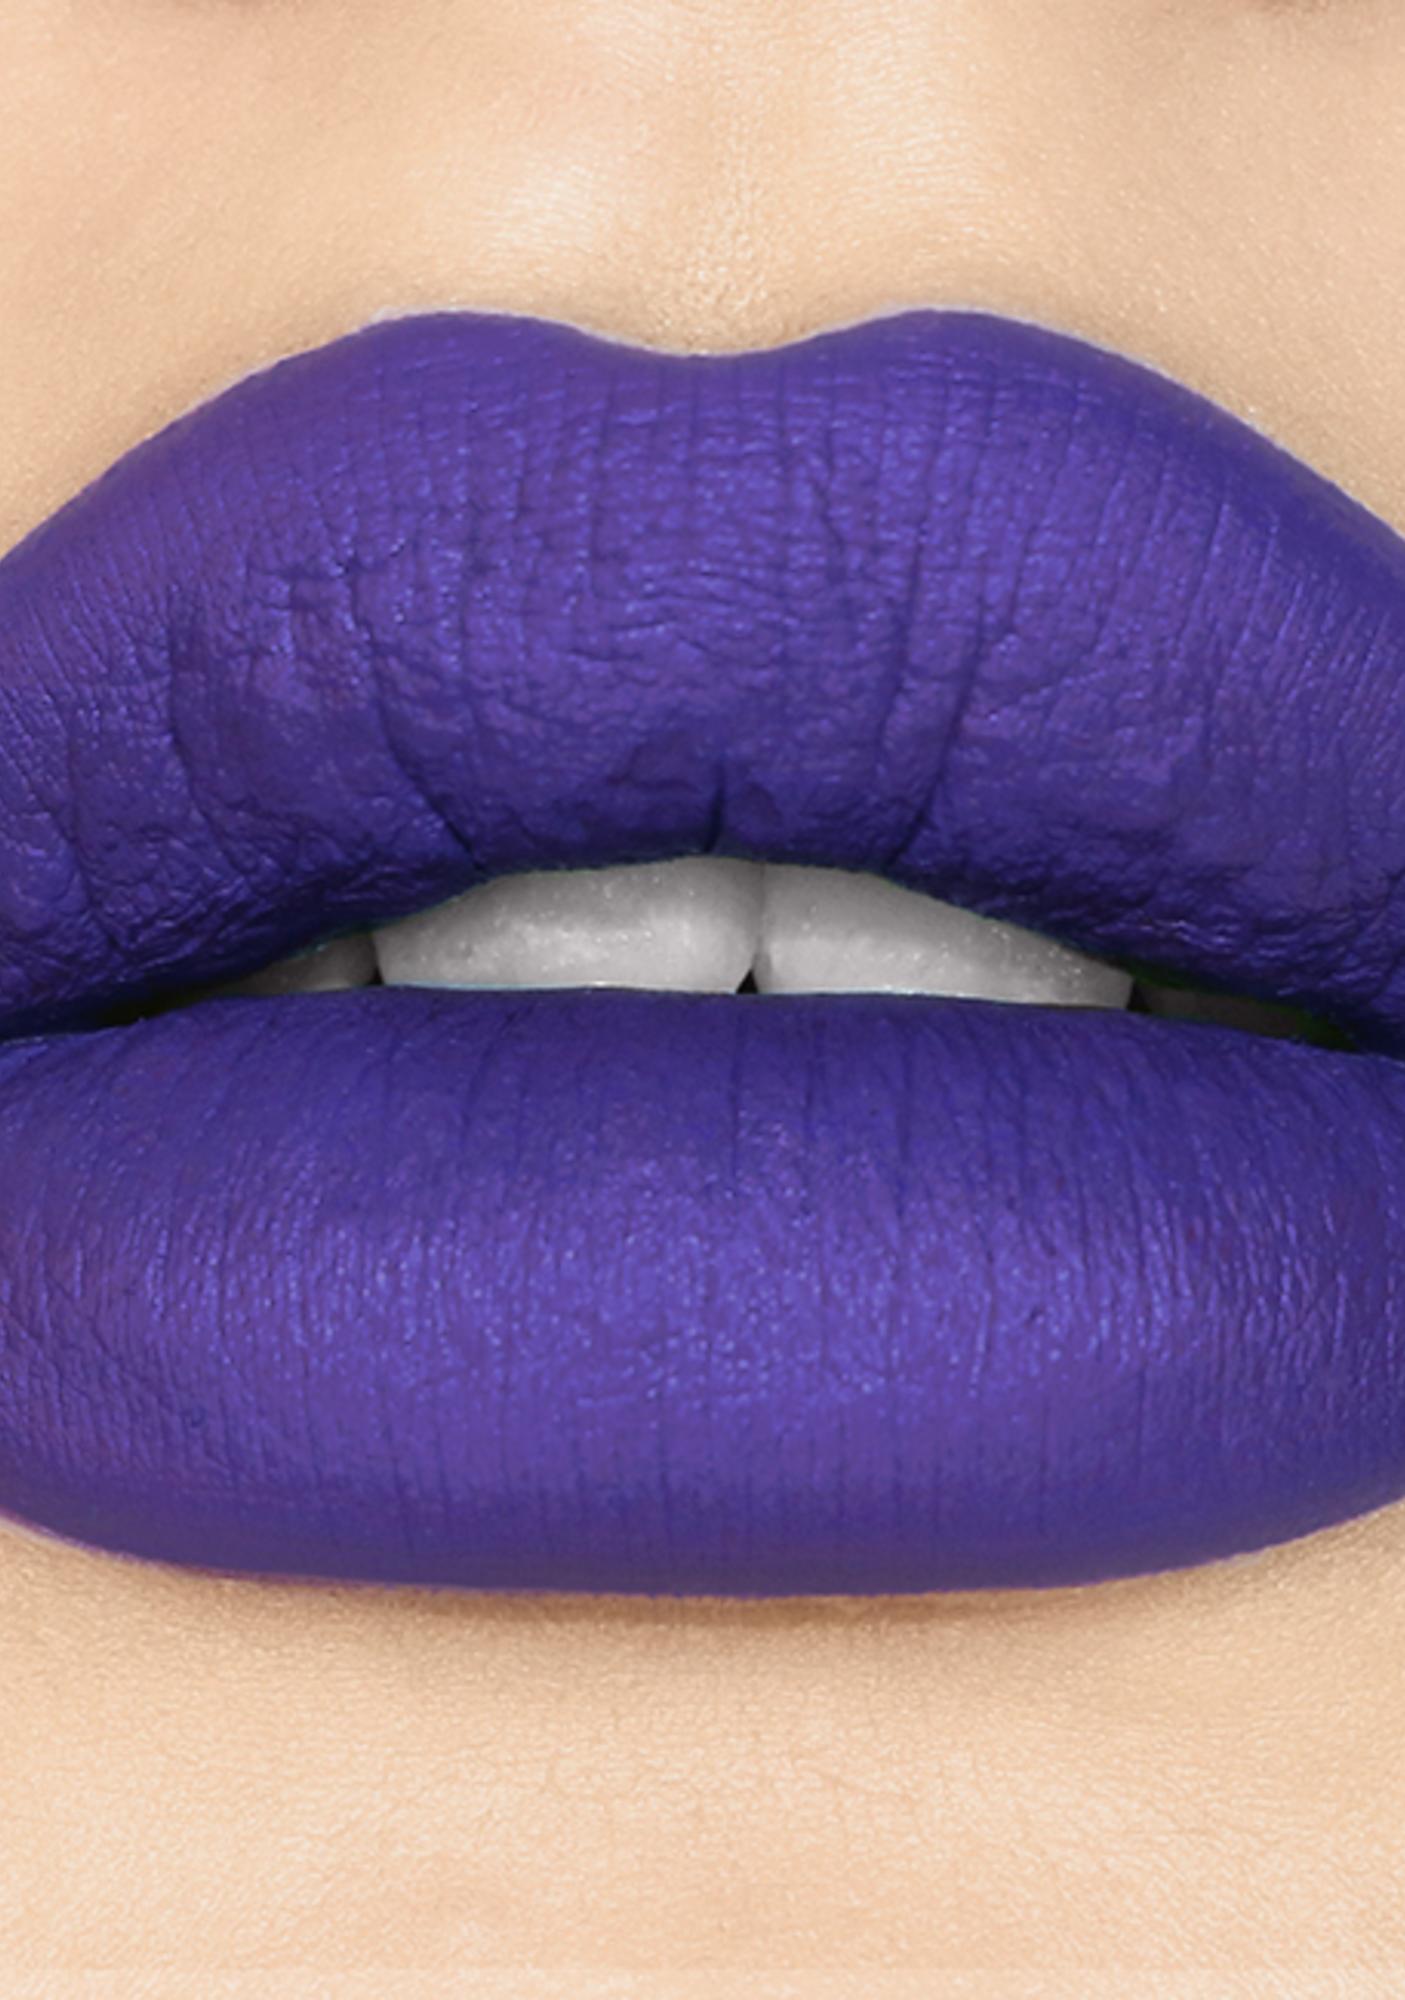 Sugarpill Spank Liquid Lipstick